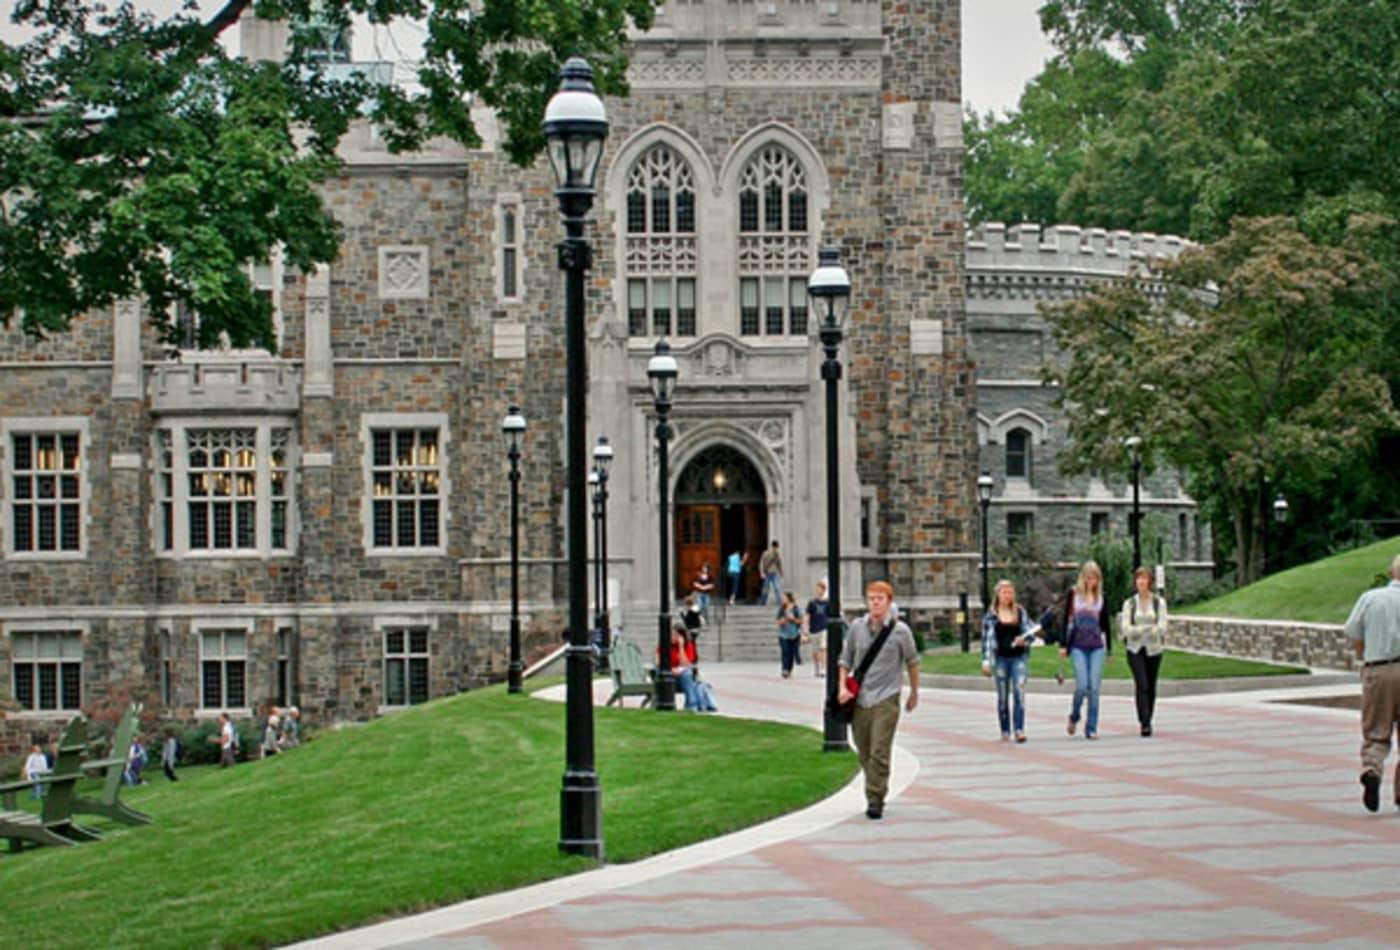 Lehigh-Colleges-Highest-Paychecks-2012-CNBC.jpg